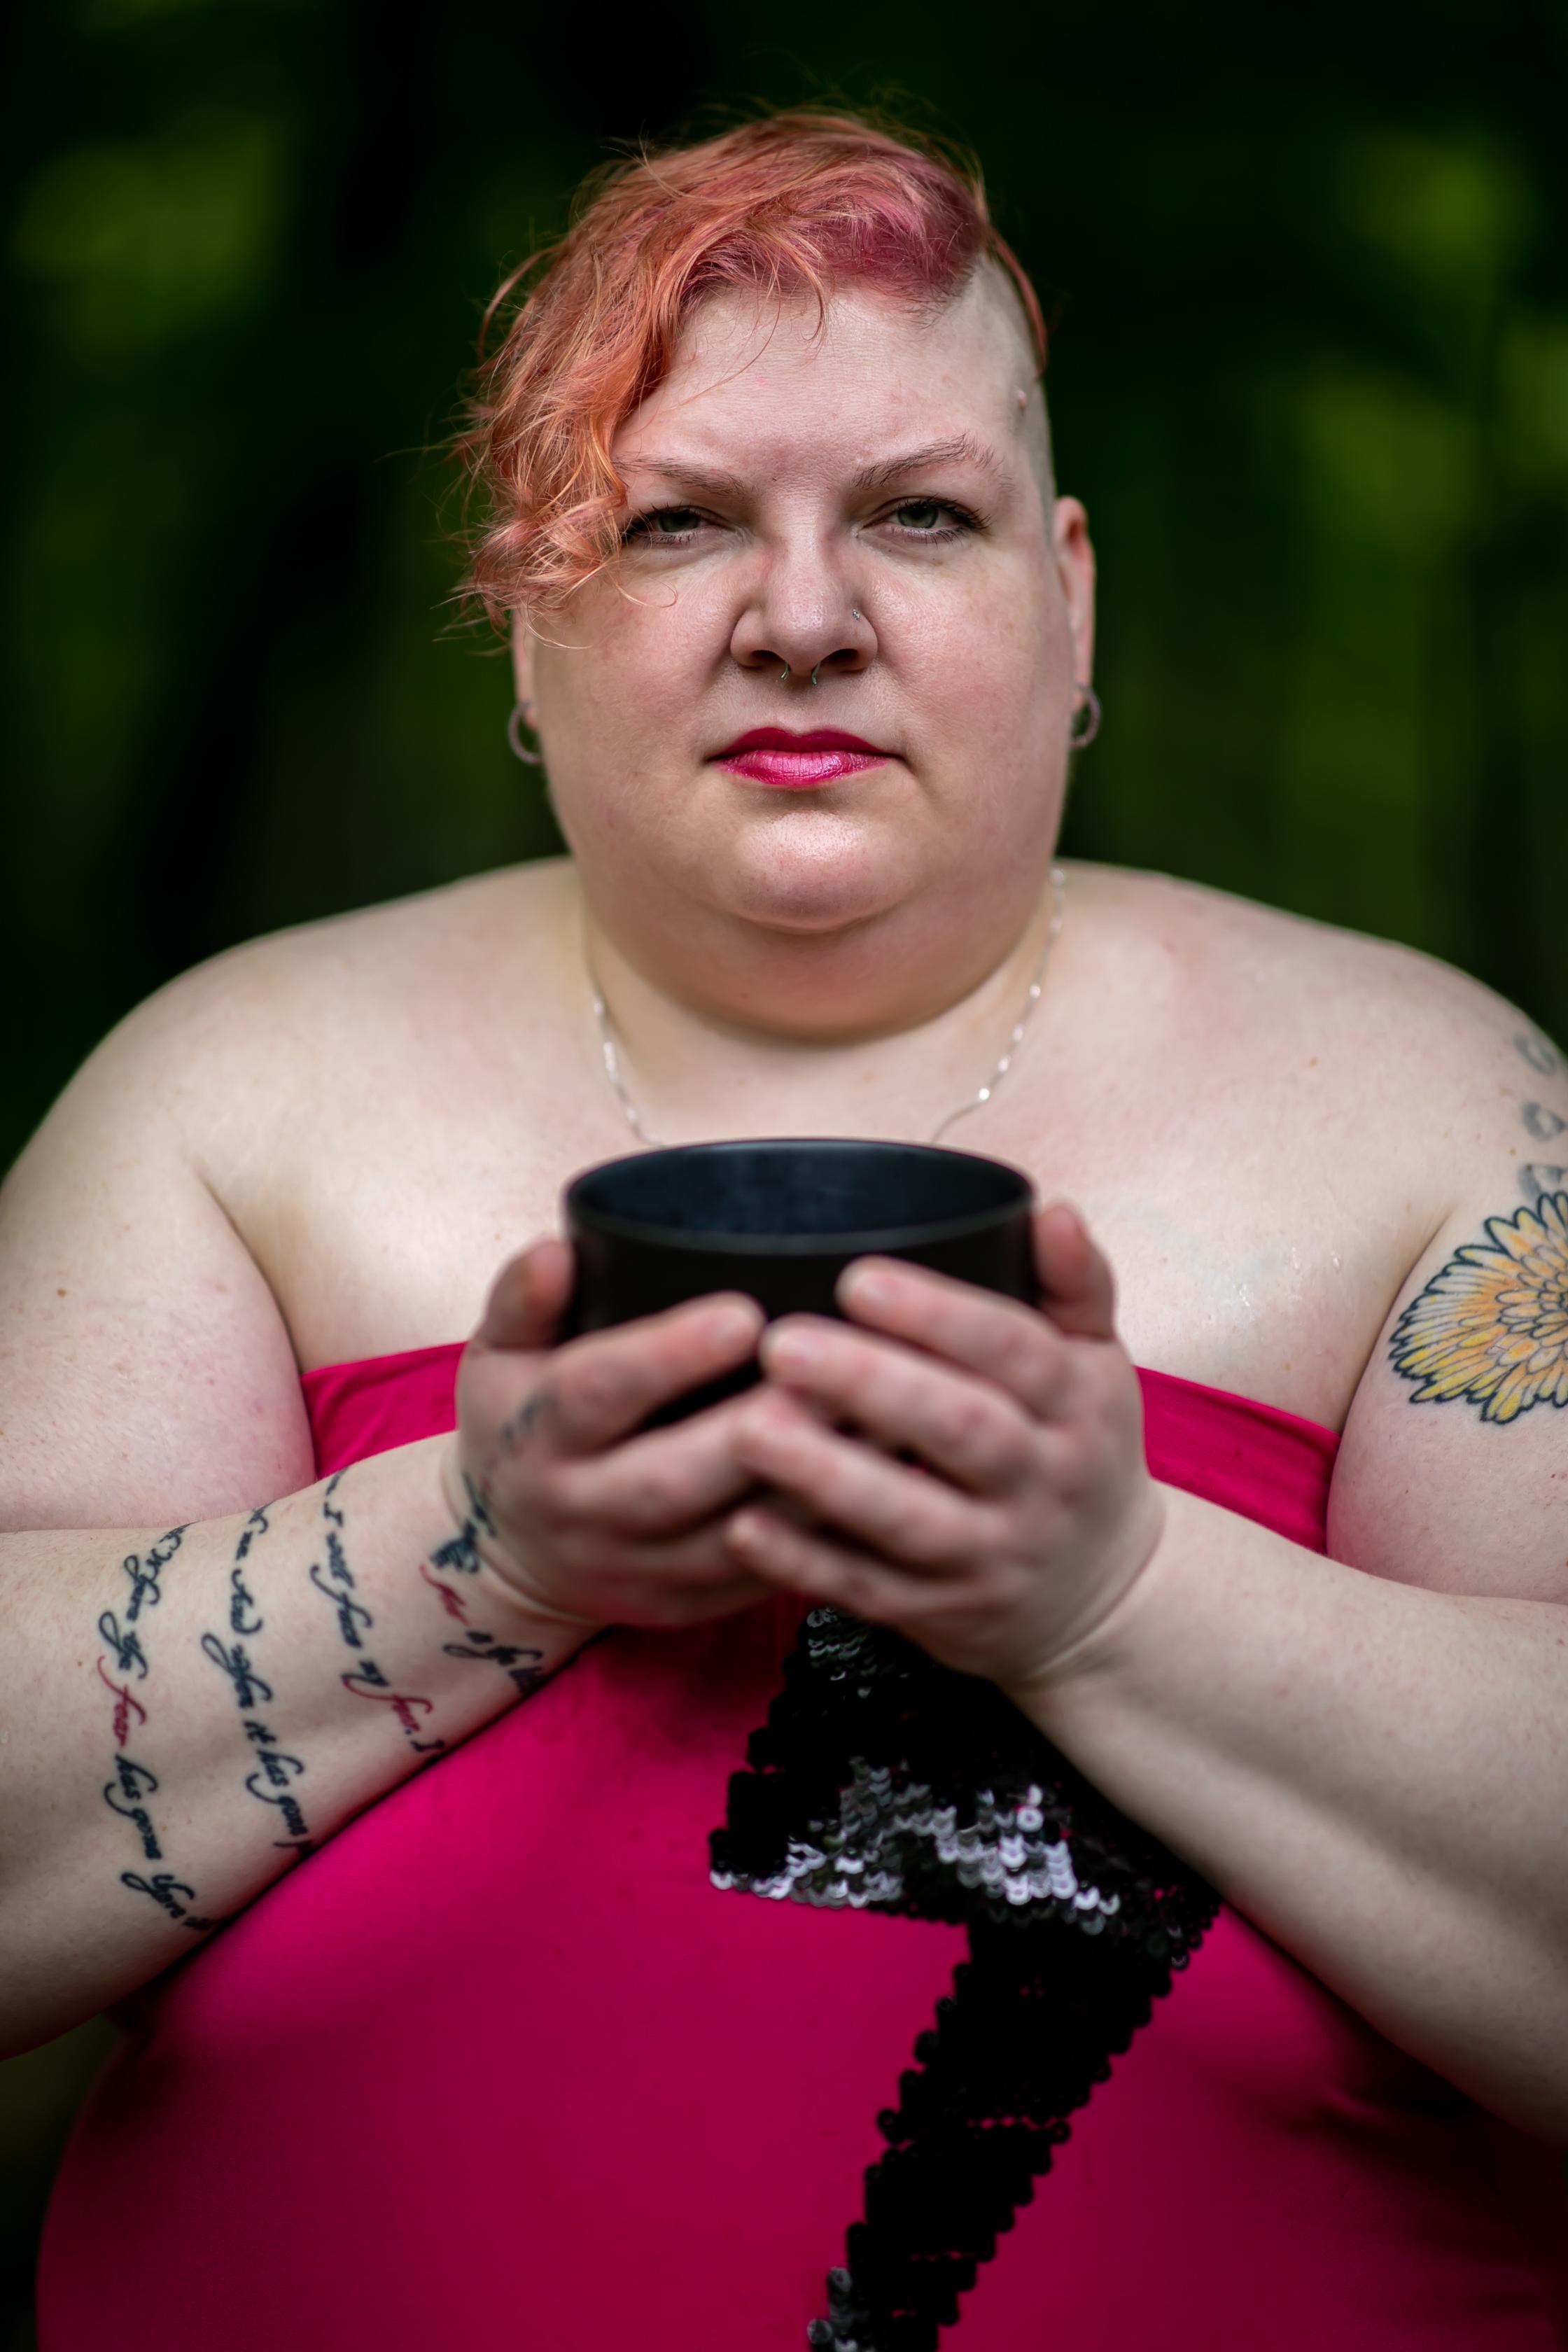 chicago lake county portrait fat anger person portrait-6715.jpg